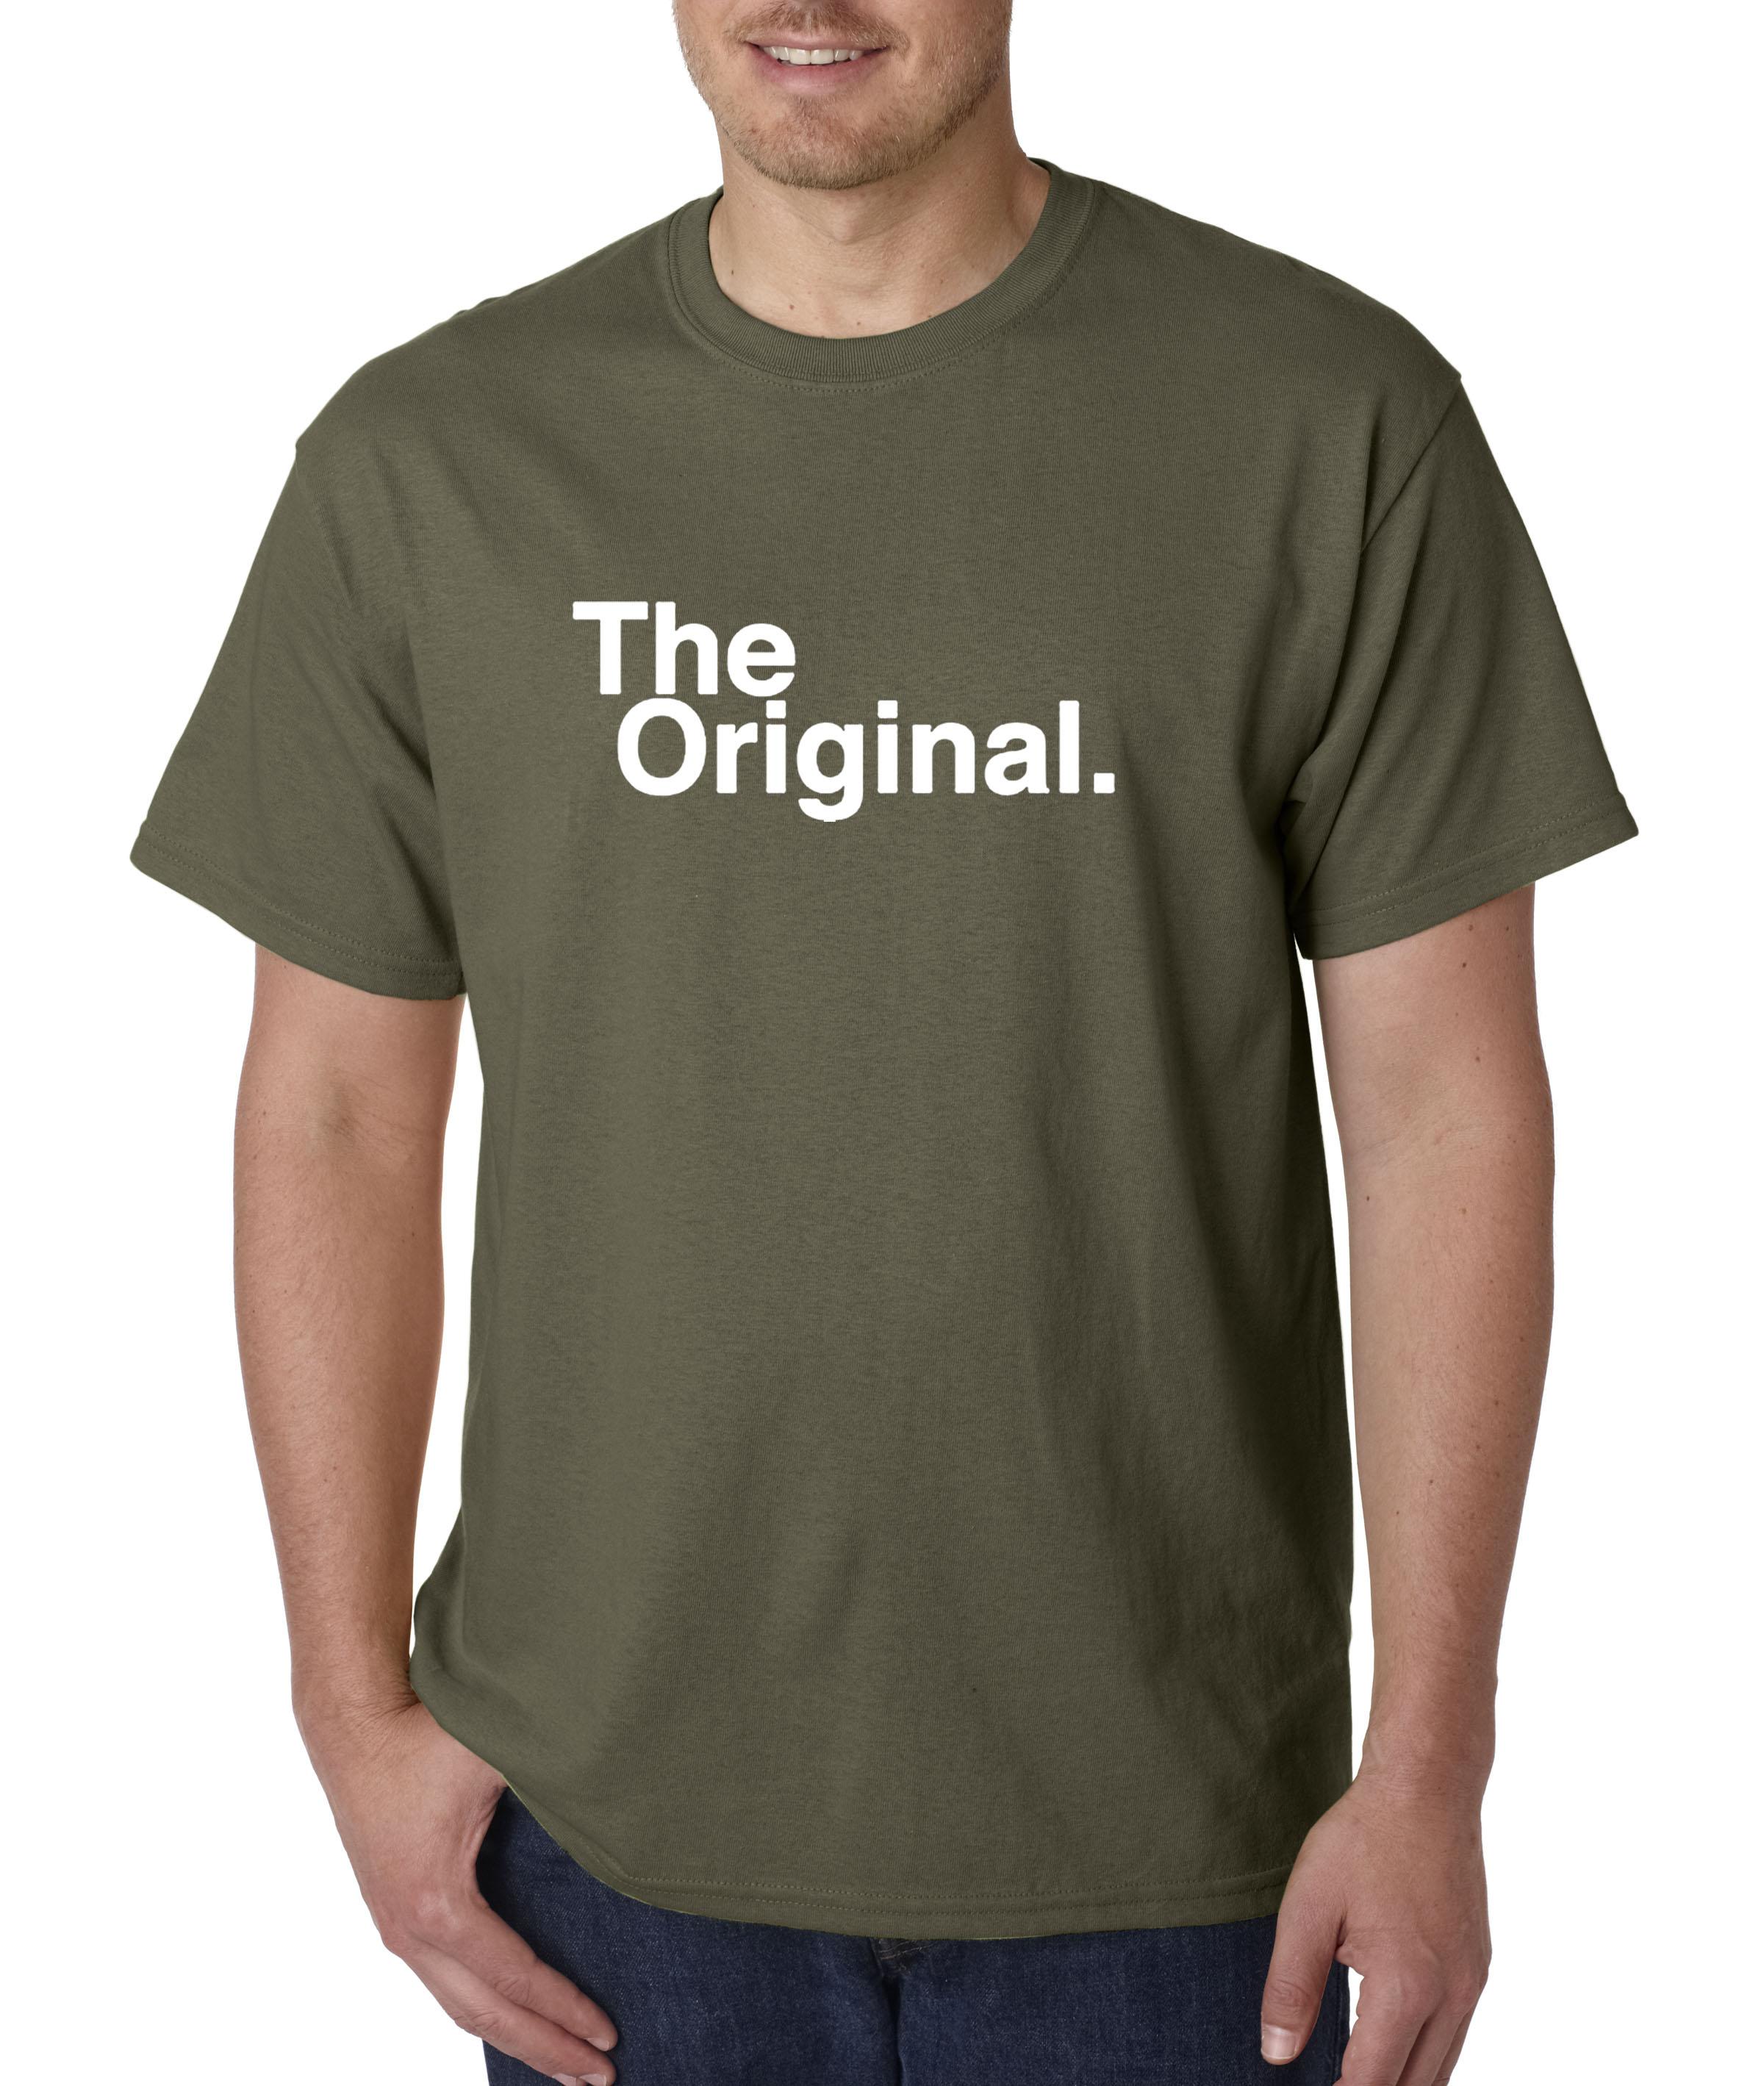 New Way 752 Unisex T Shirt The Original Og 2xl Military Green